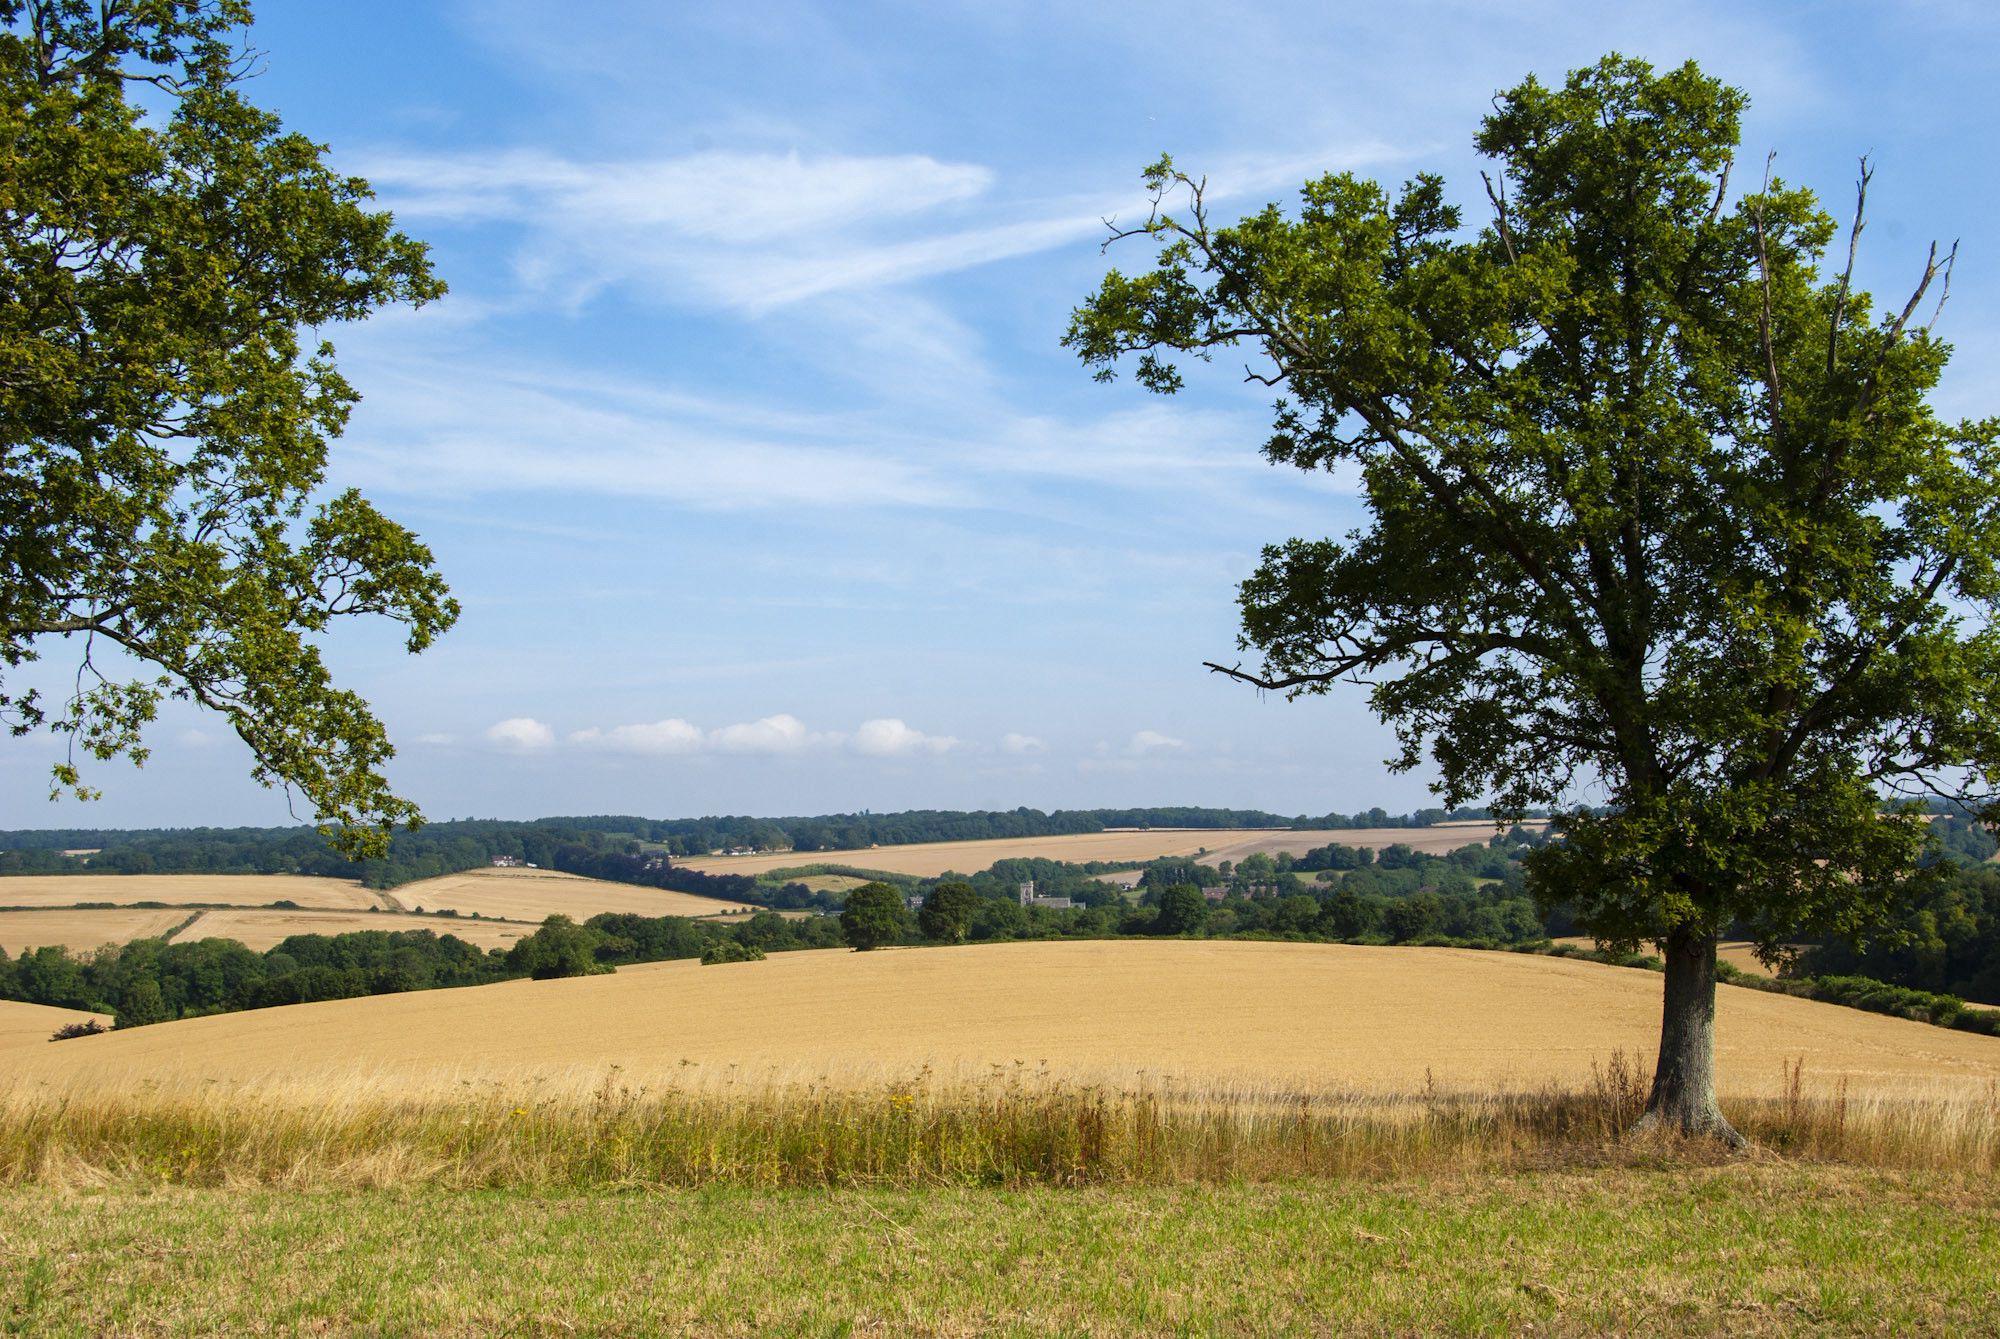 Petersfield Camping | Best campsites in Petersfield, Hampshire